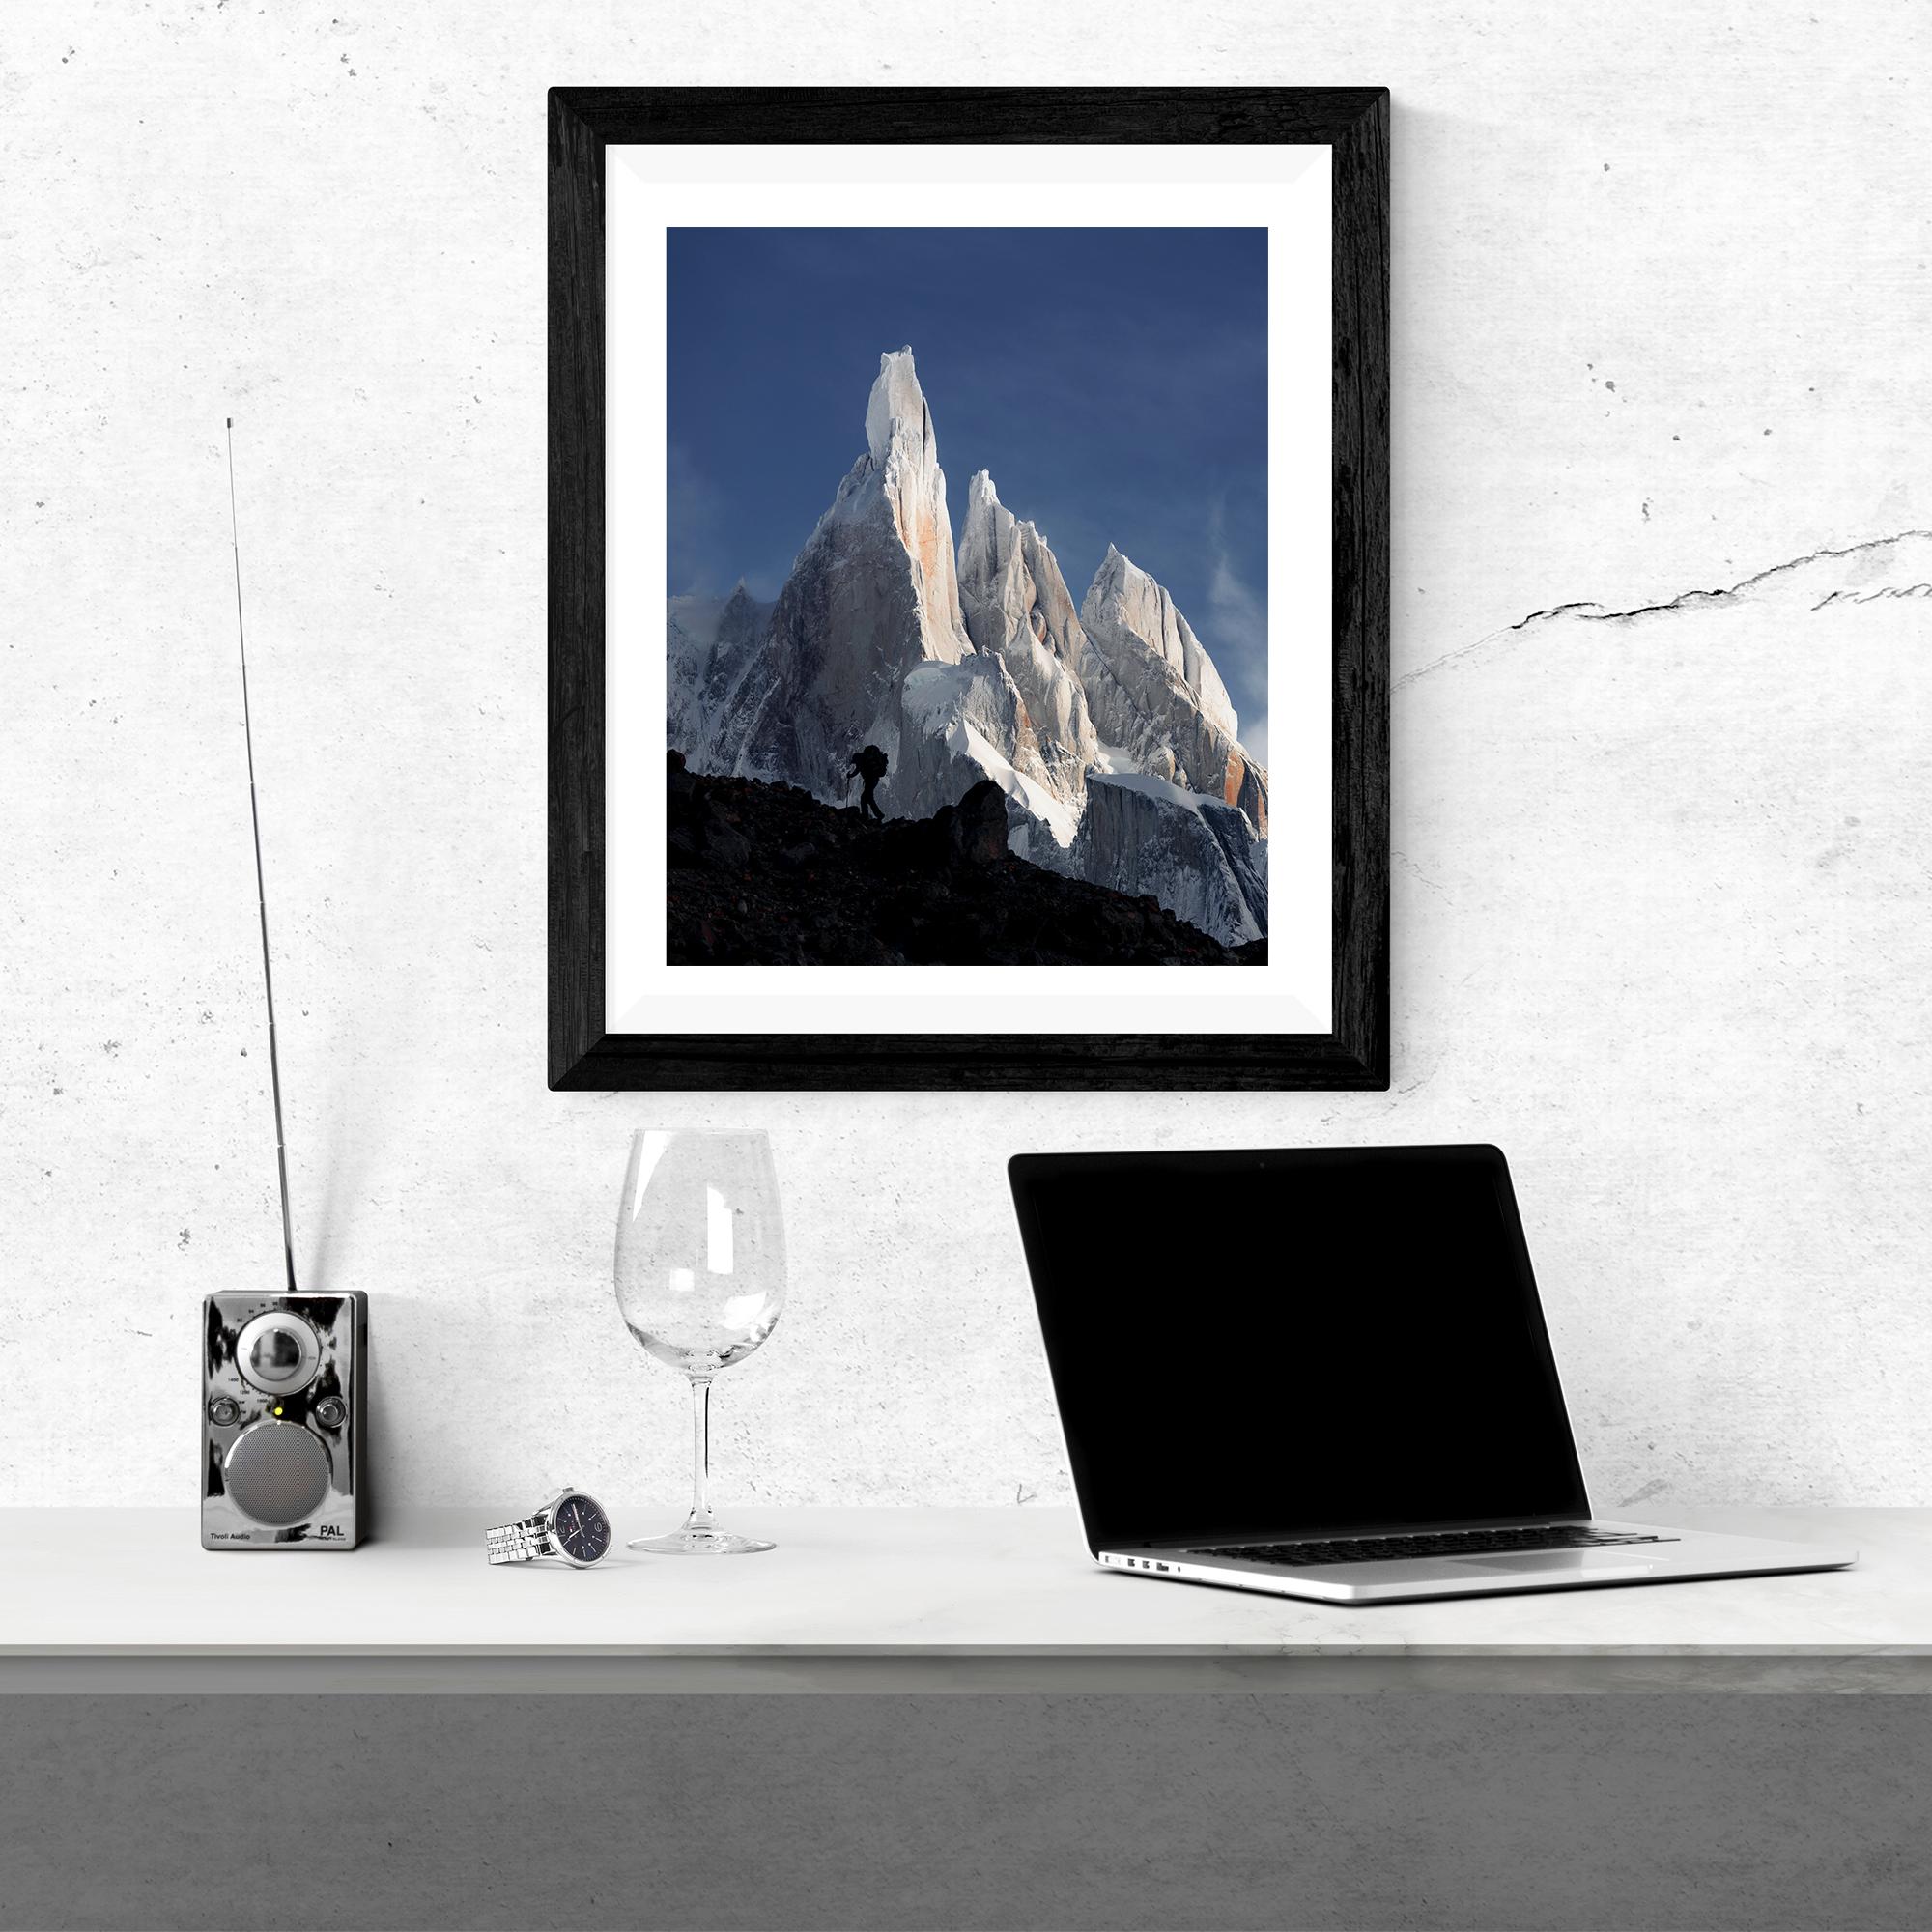 Frame with Macbook Pro Mockup 1.jpg